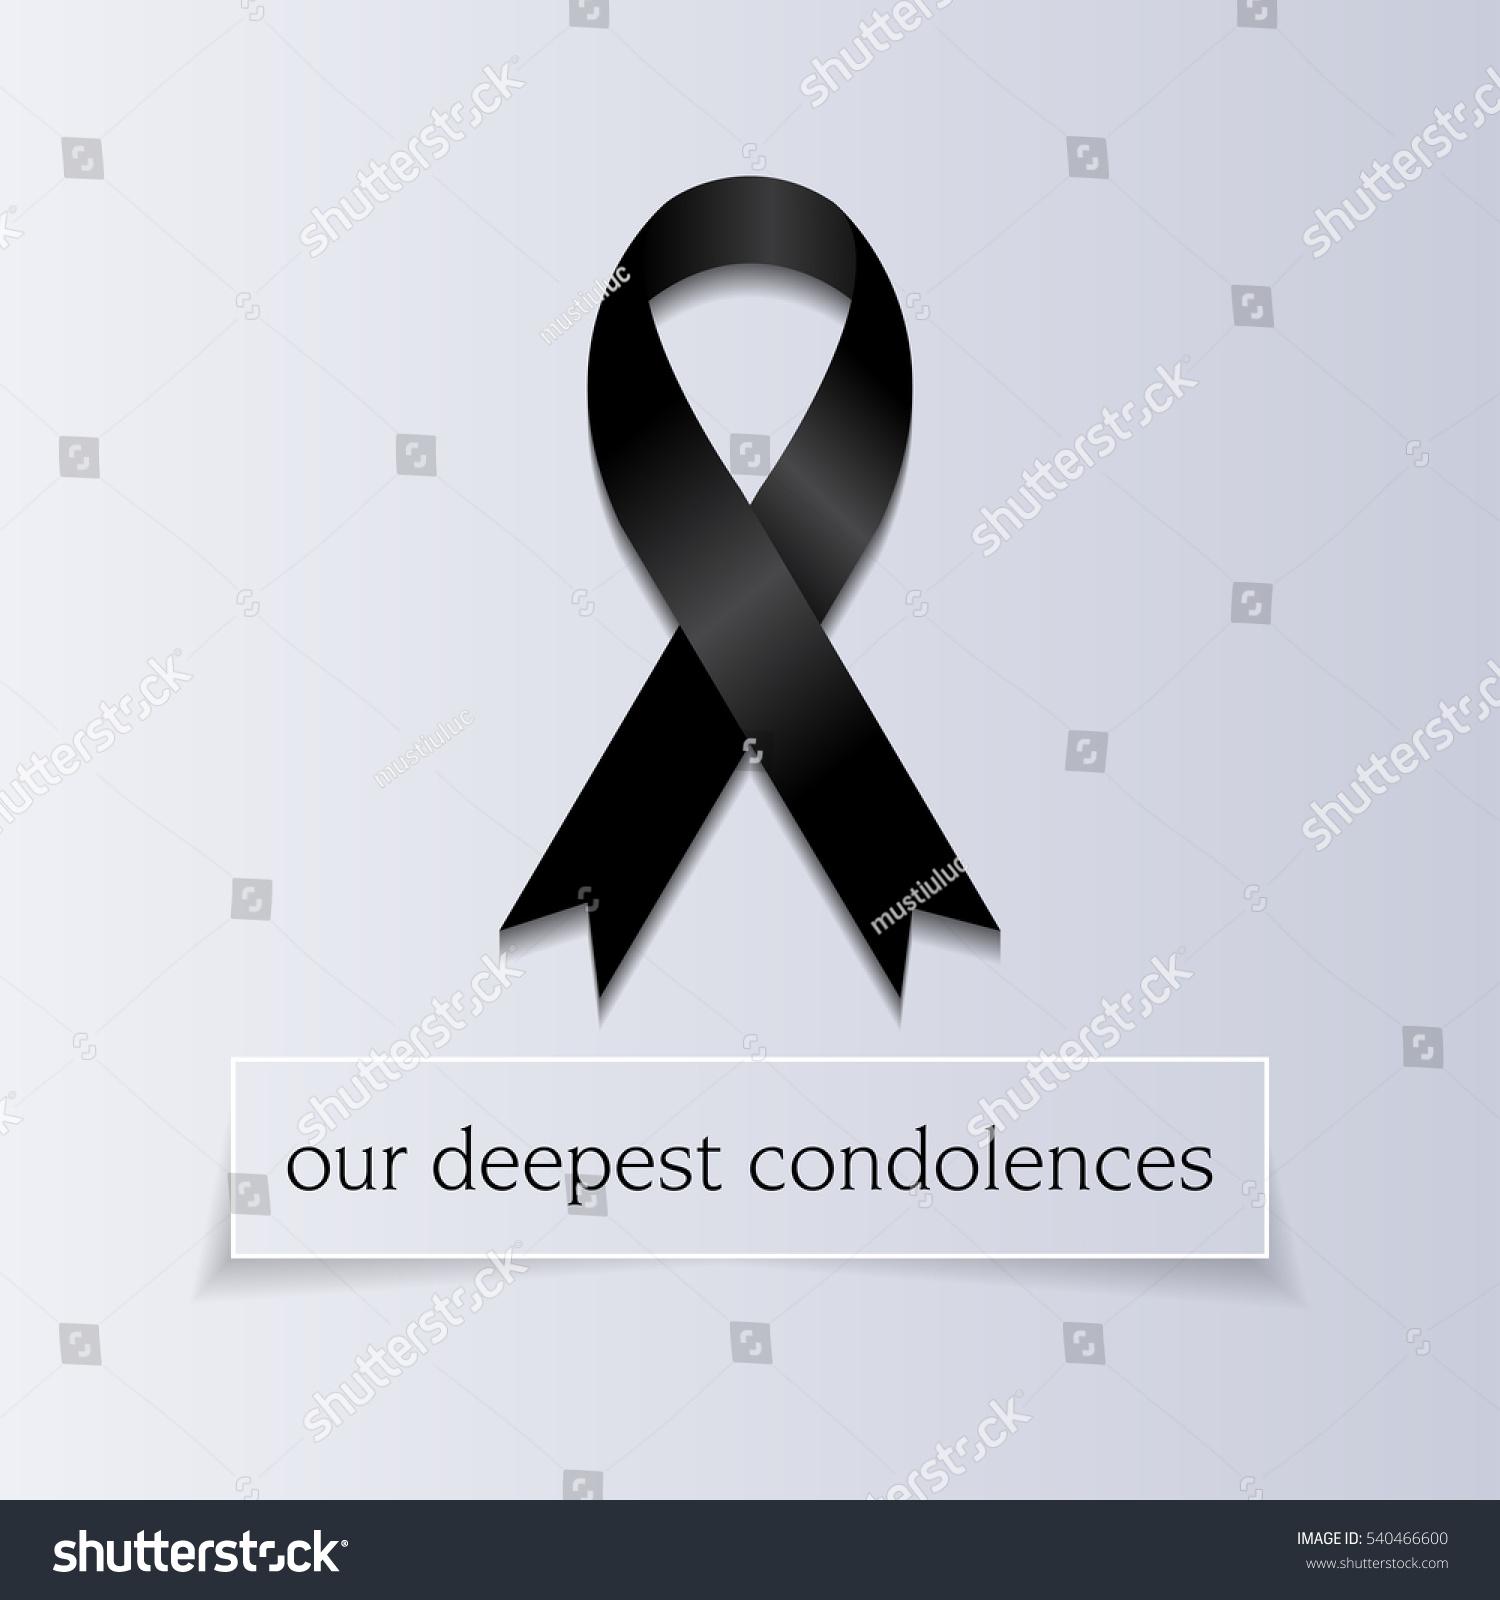 Our Deepest Condolences Sympathetic Condolence Card Stock Vector